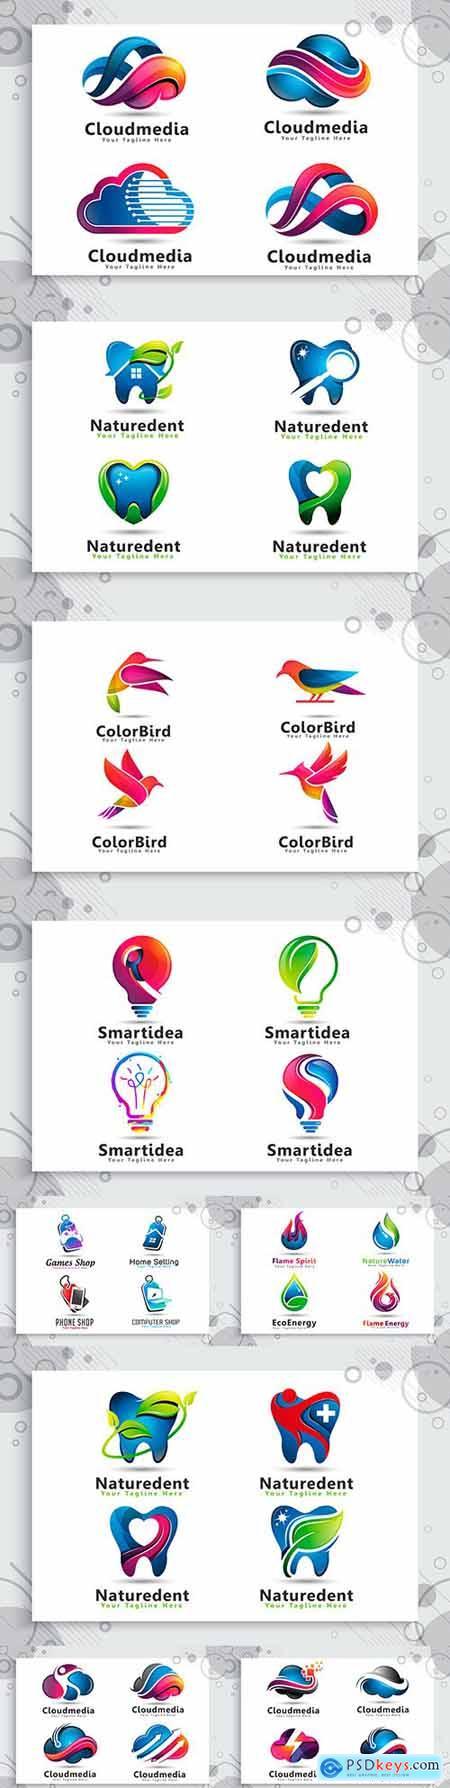 Brand name company business corporate logos design 15